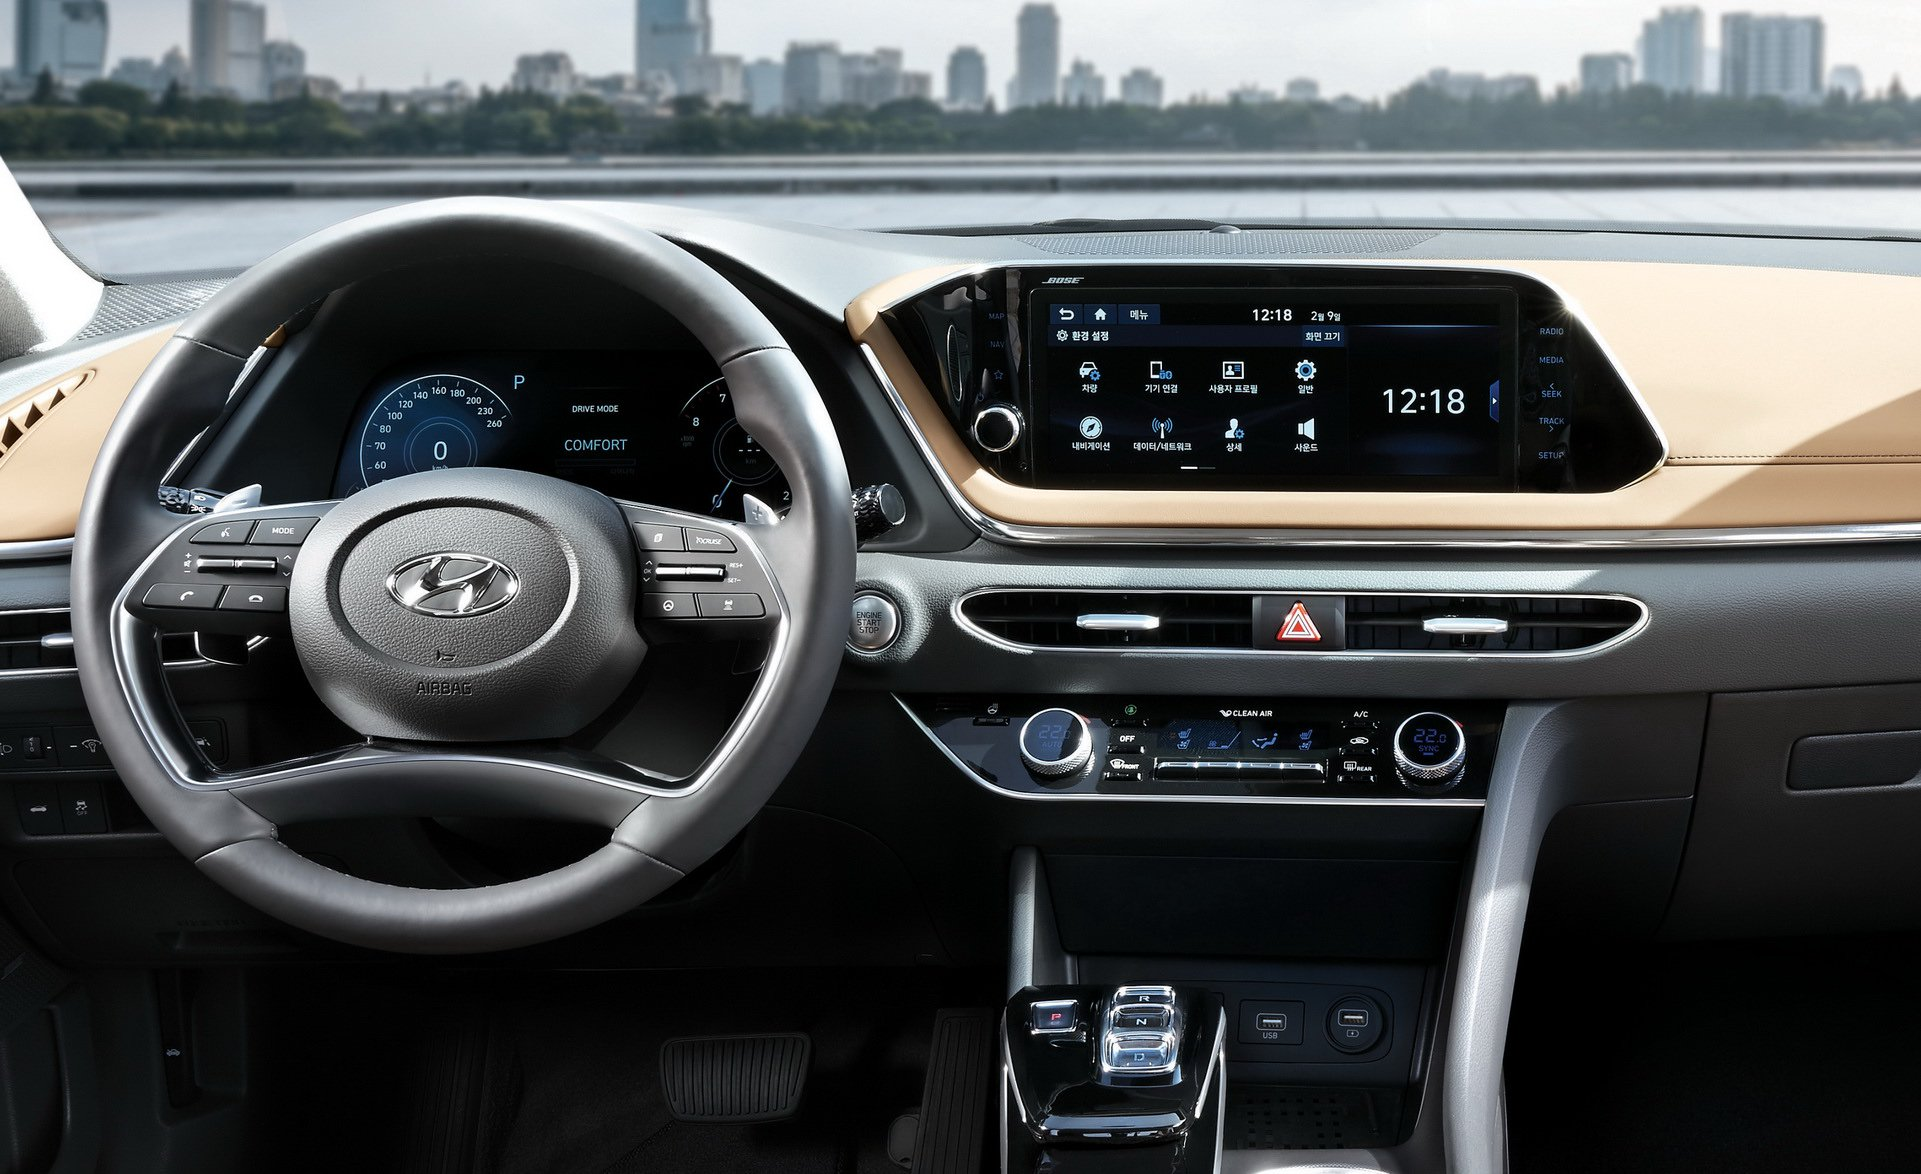 Hyundai Sonata Salon Nueva York (2)